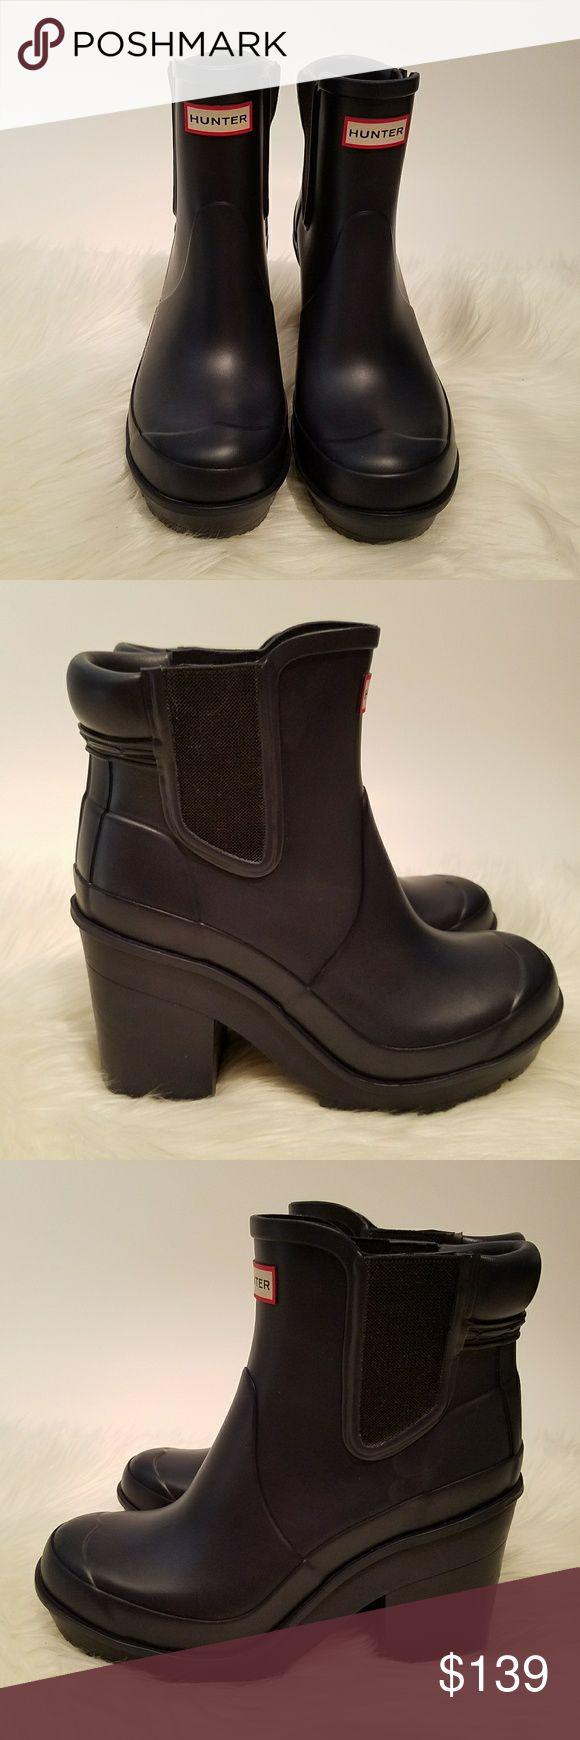 Selling this NWOB Hunter Original Block Heel Chelsea Boot on Poshmark! My username is: cedar_closet. #shopmycloset #poshmark #fashion #shopping #style #forsale #Hunter #Shoes